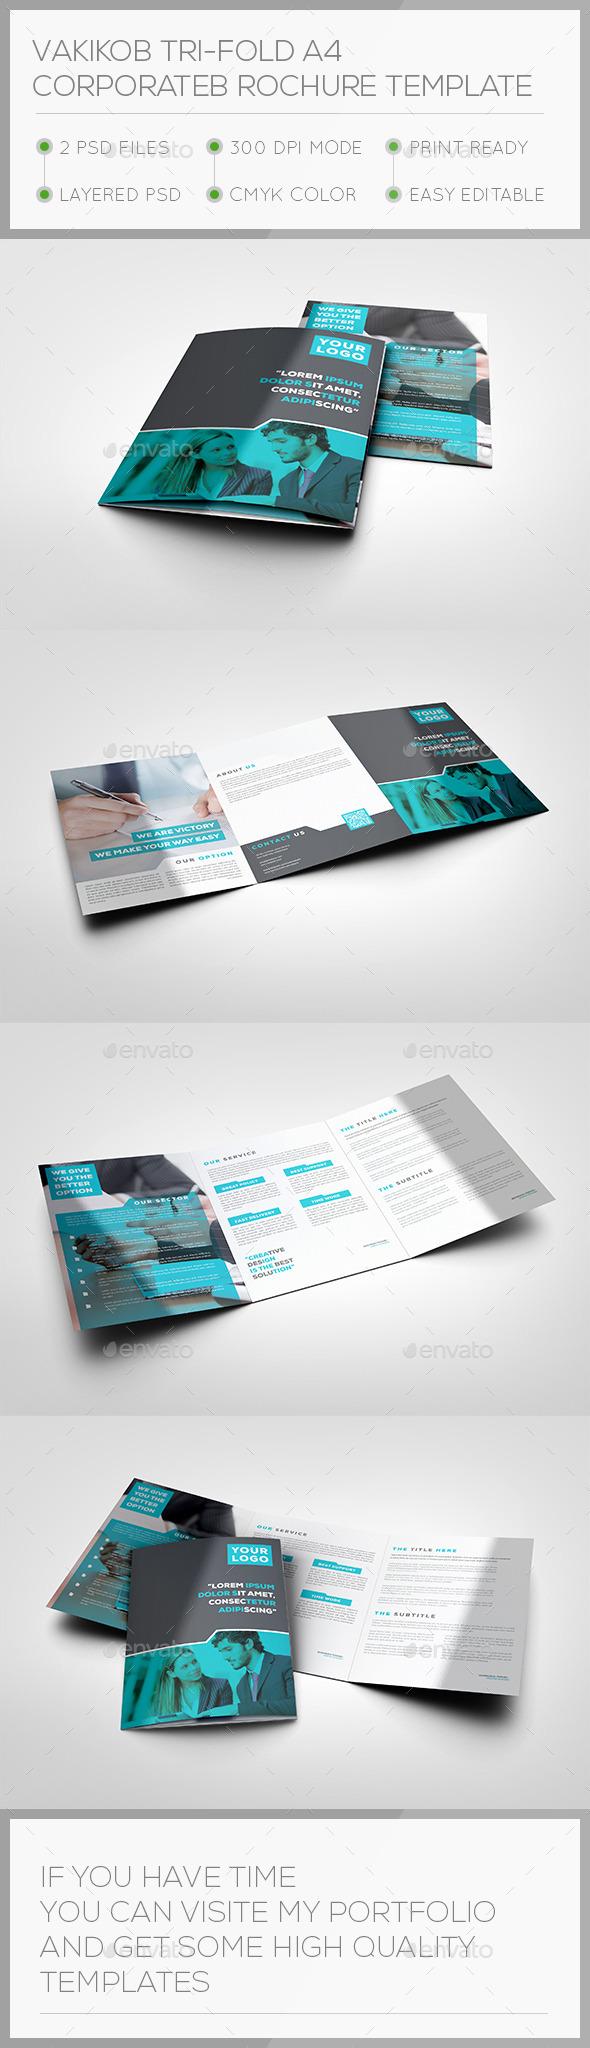 Vakikob Tri-fold A4 Corporate Brochure Template - Brochures Print Templates